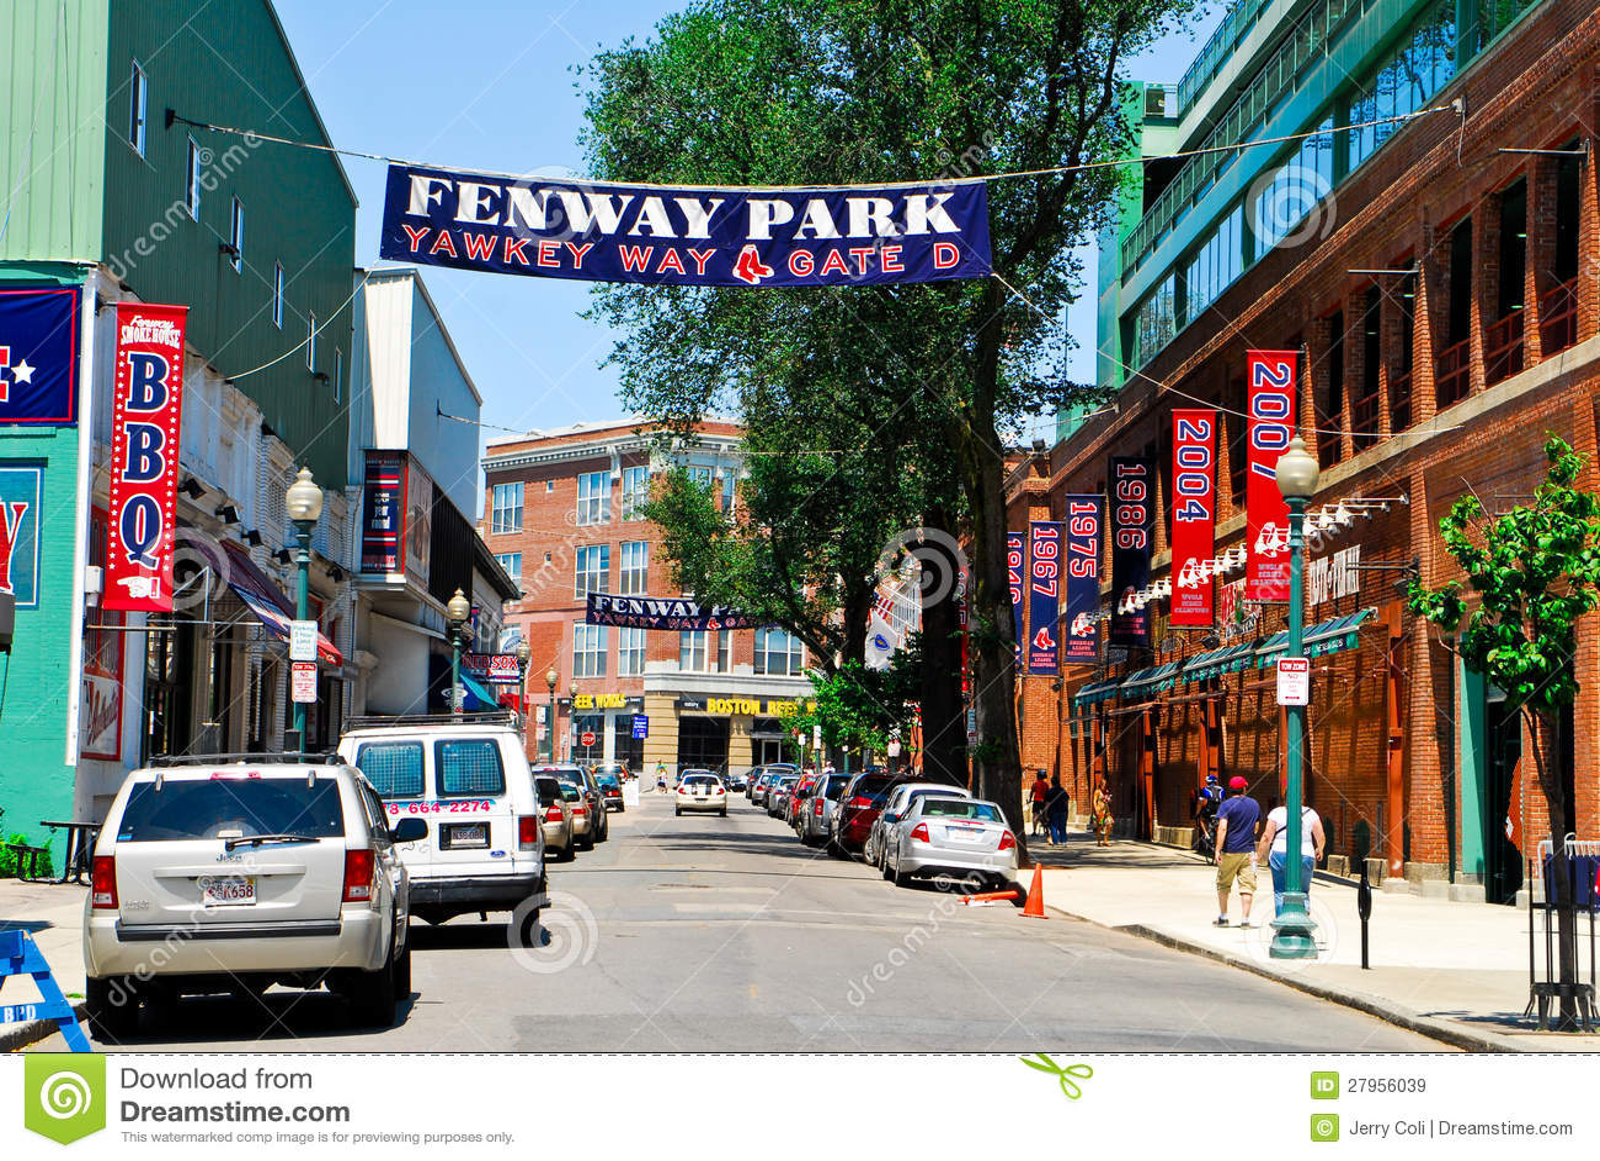 Patriots Wallpaper Hd Yawkey Way At Fenway Park Boston Ma Editorial Stock